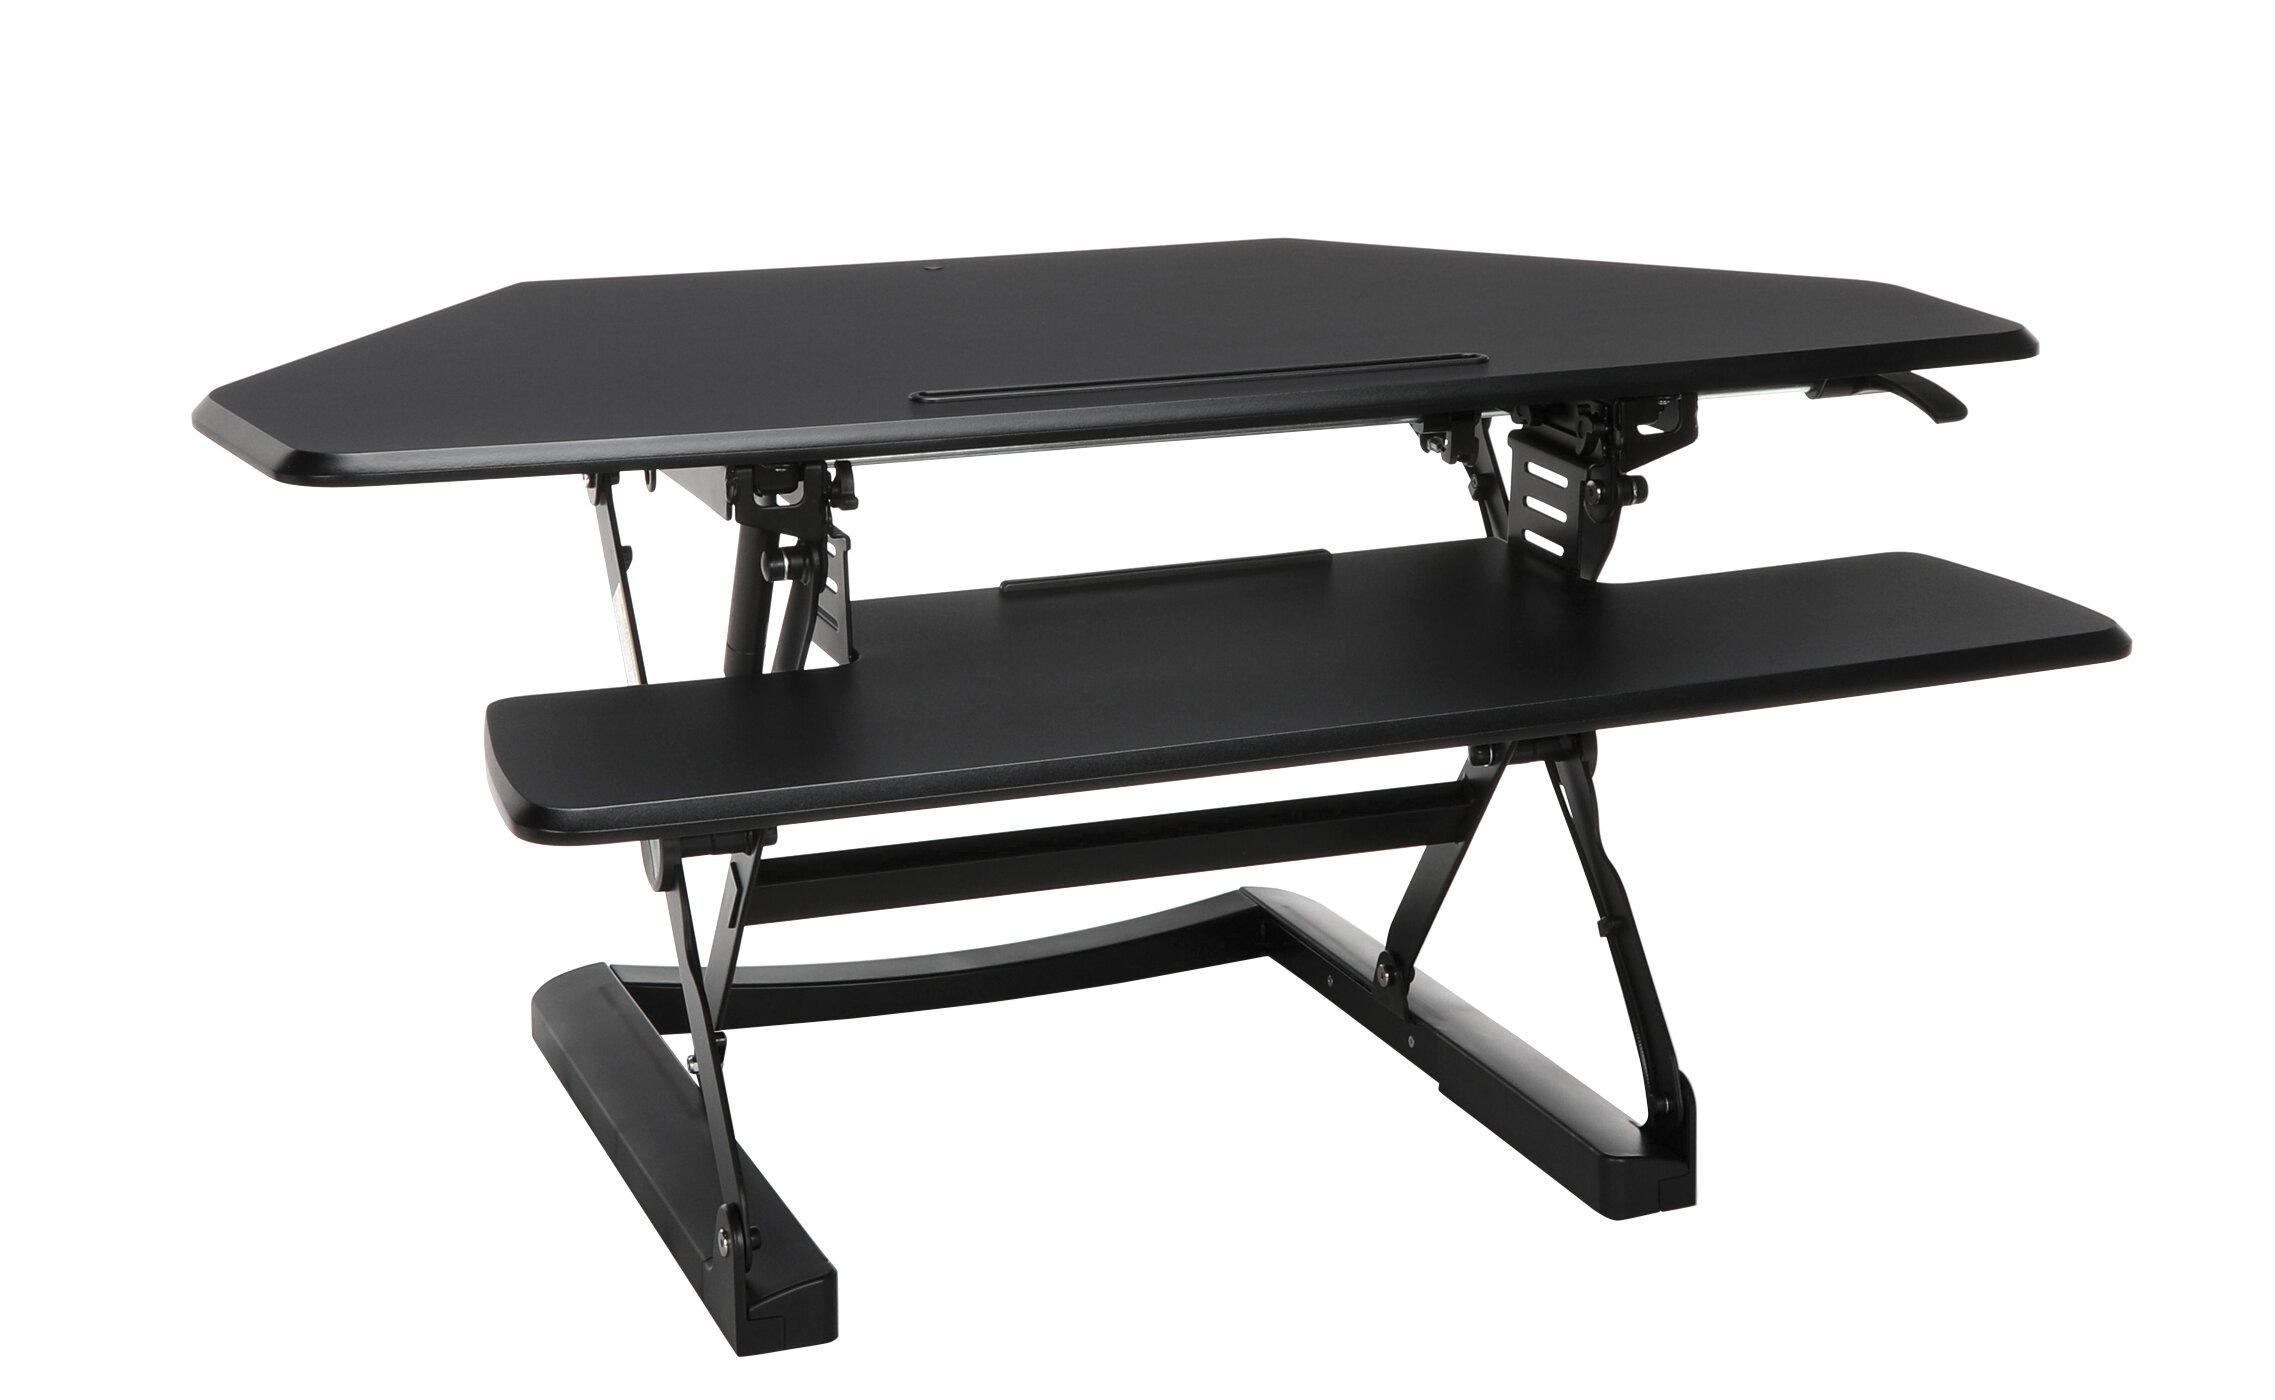 Symple Stuff Heiman Riser Corner L Shaped Height Adjustable Standing Desk  Converter | Wayfair